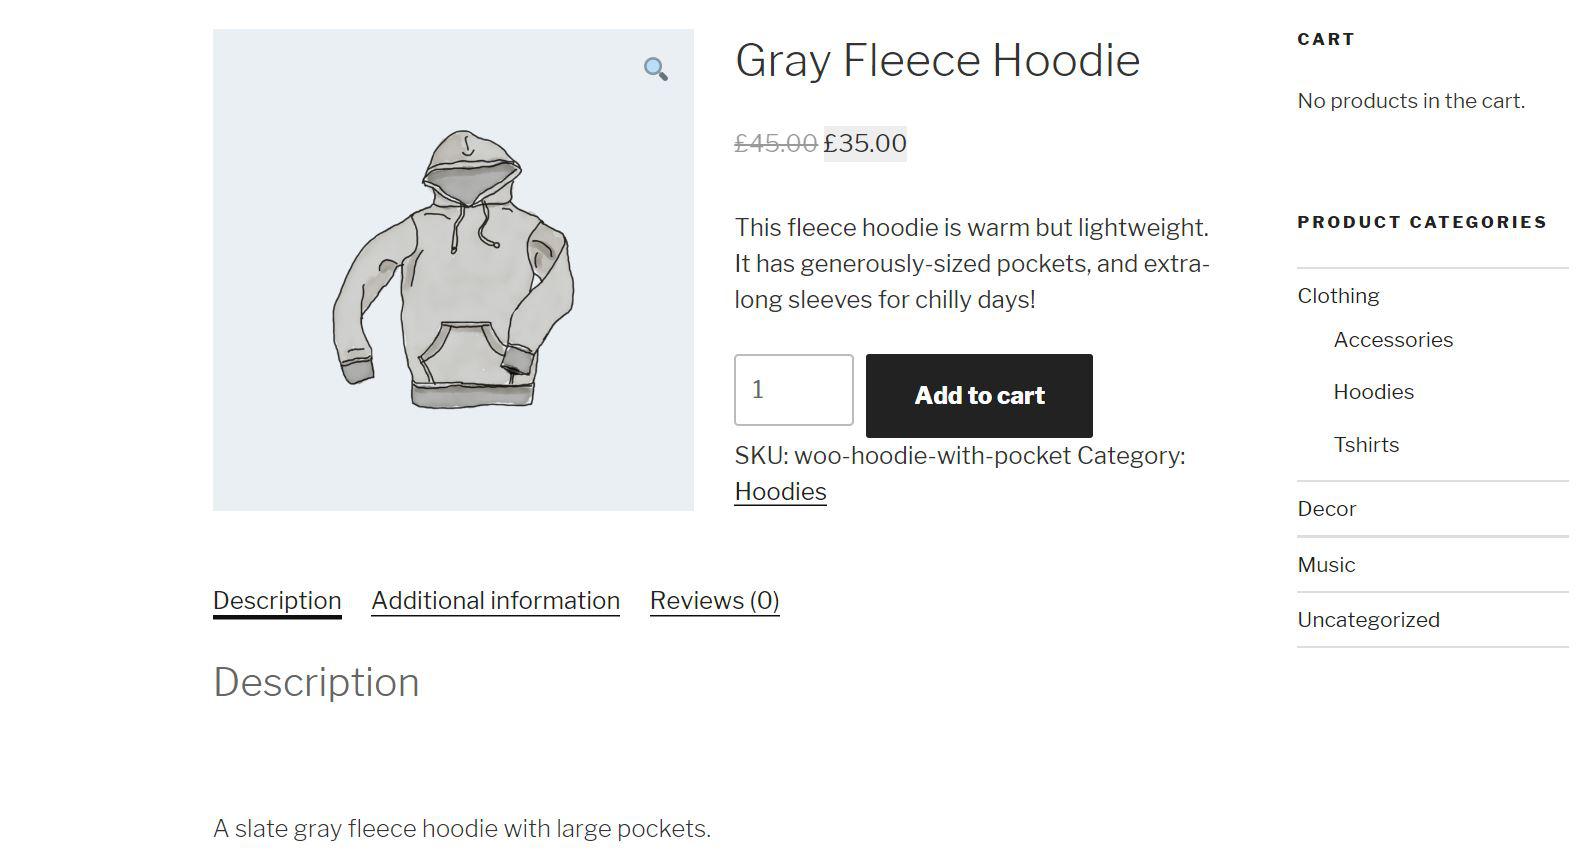 A WooCommerce product description.